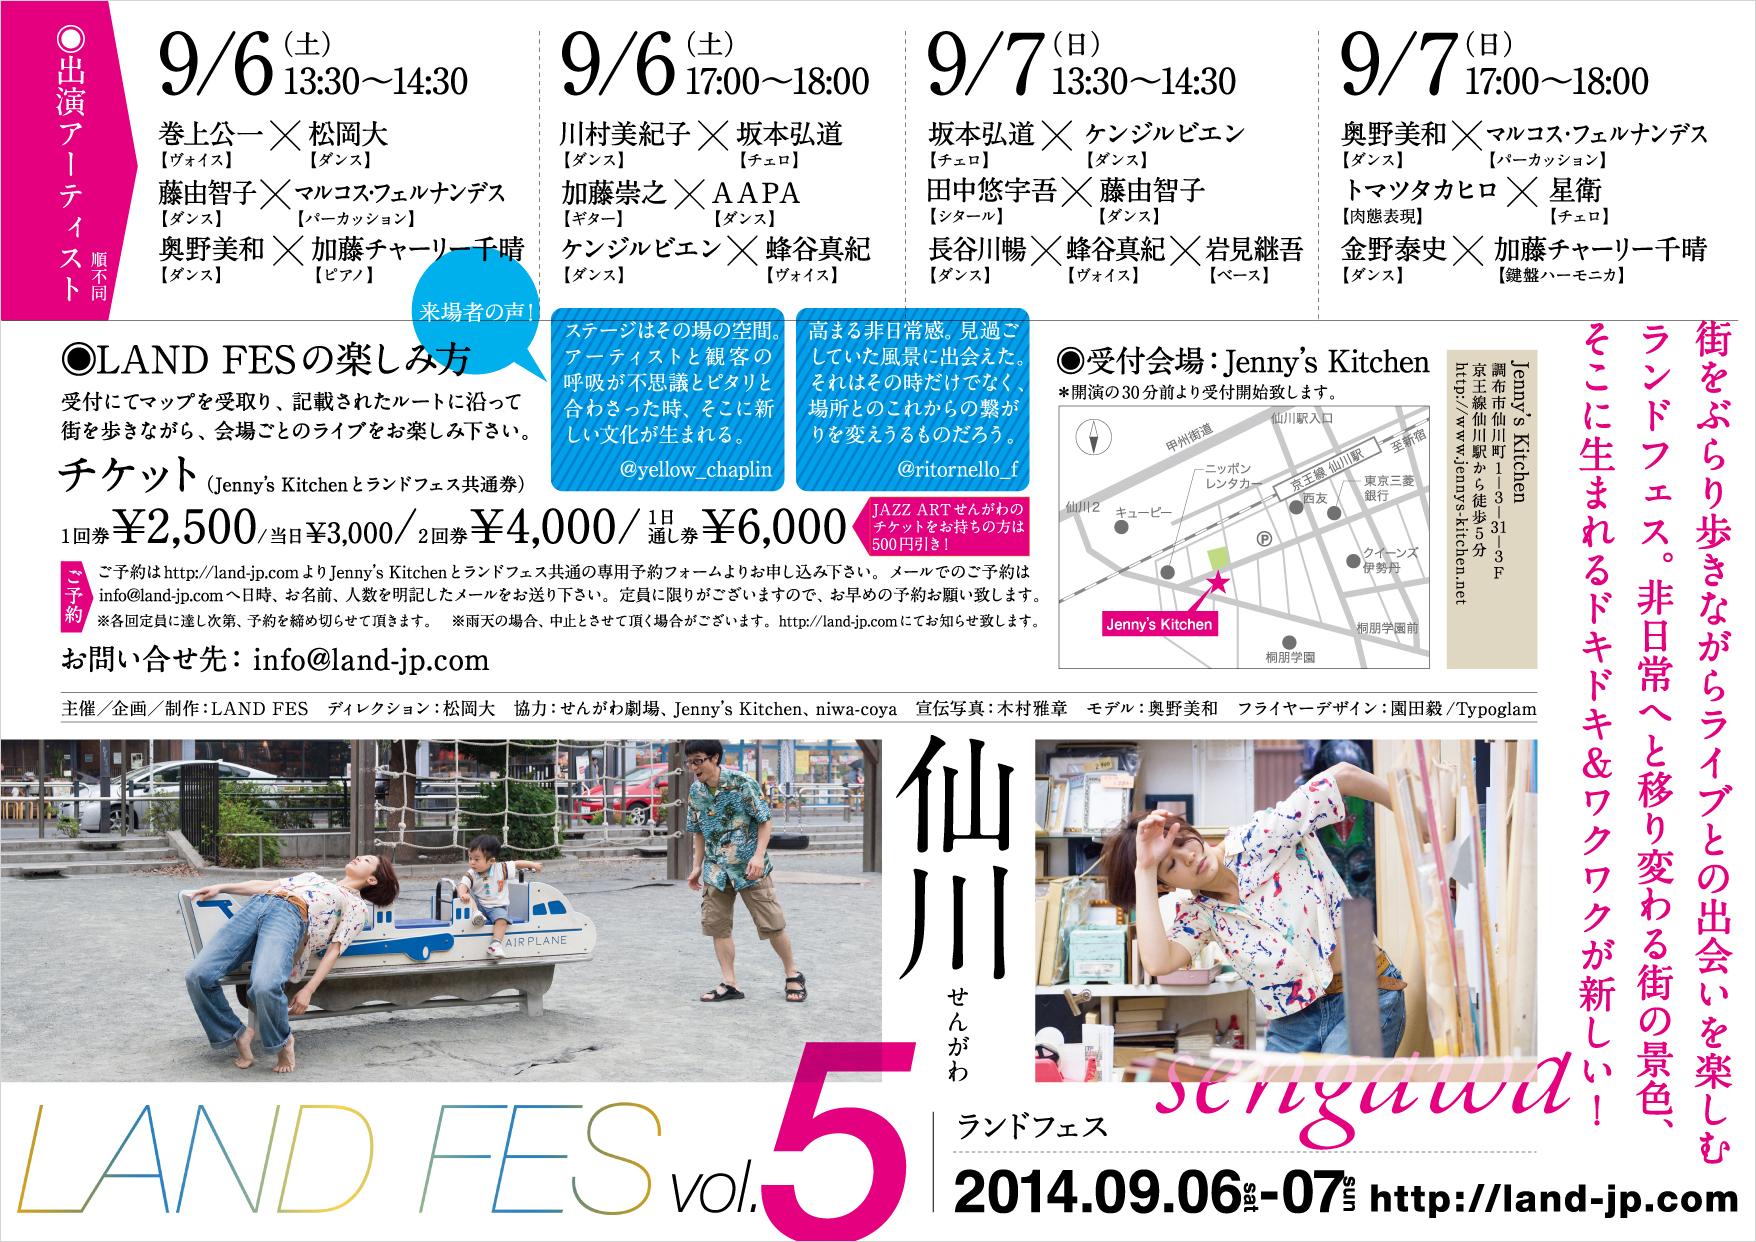 LandFes_Sengawa_A-02